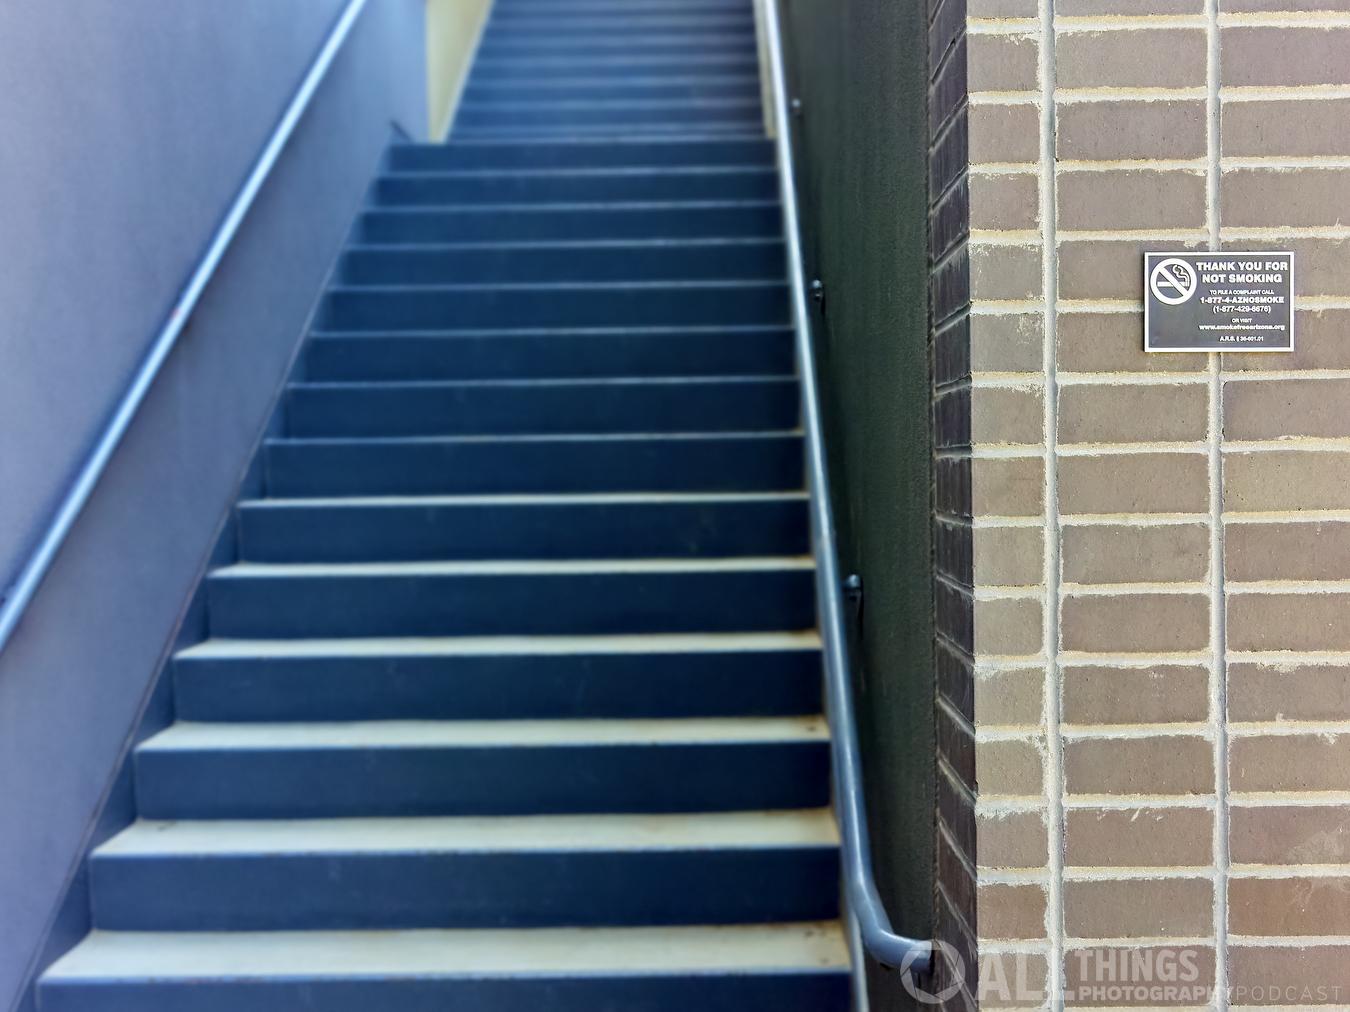 no smoking stairway